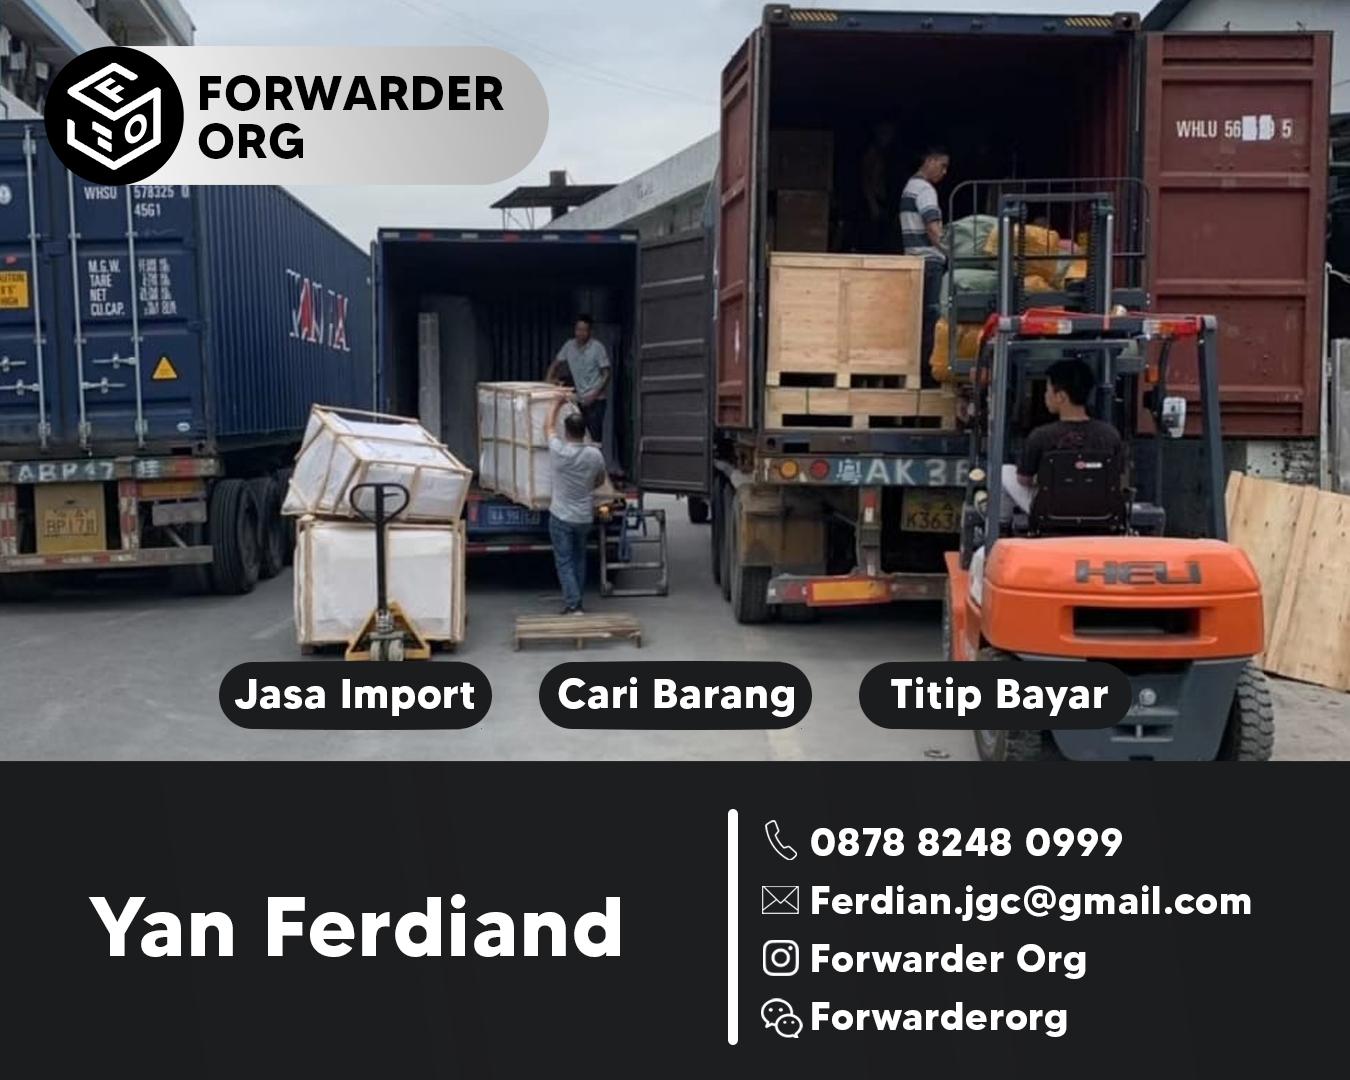 Jasa Import Sparepart Alat Berat dari China | FORWARDER ORG